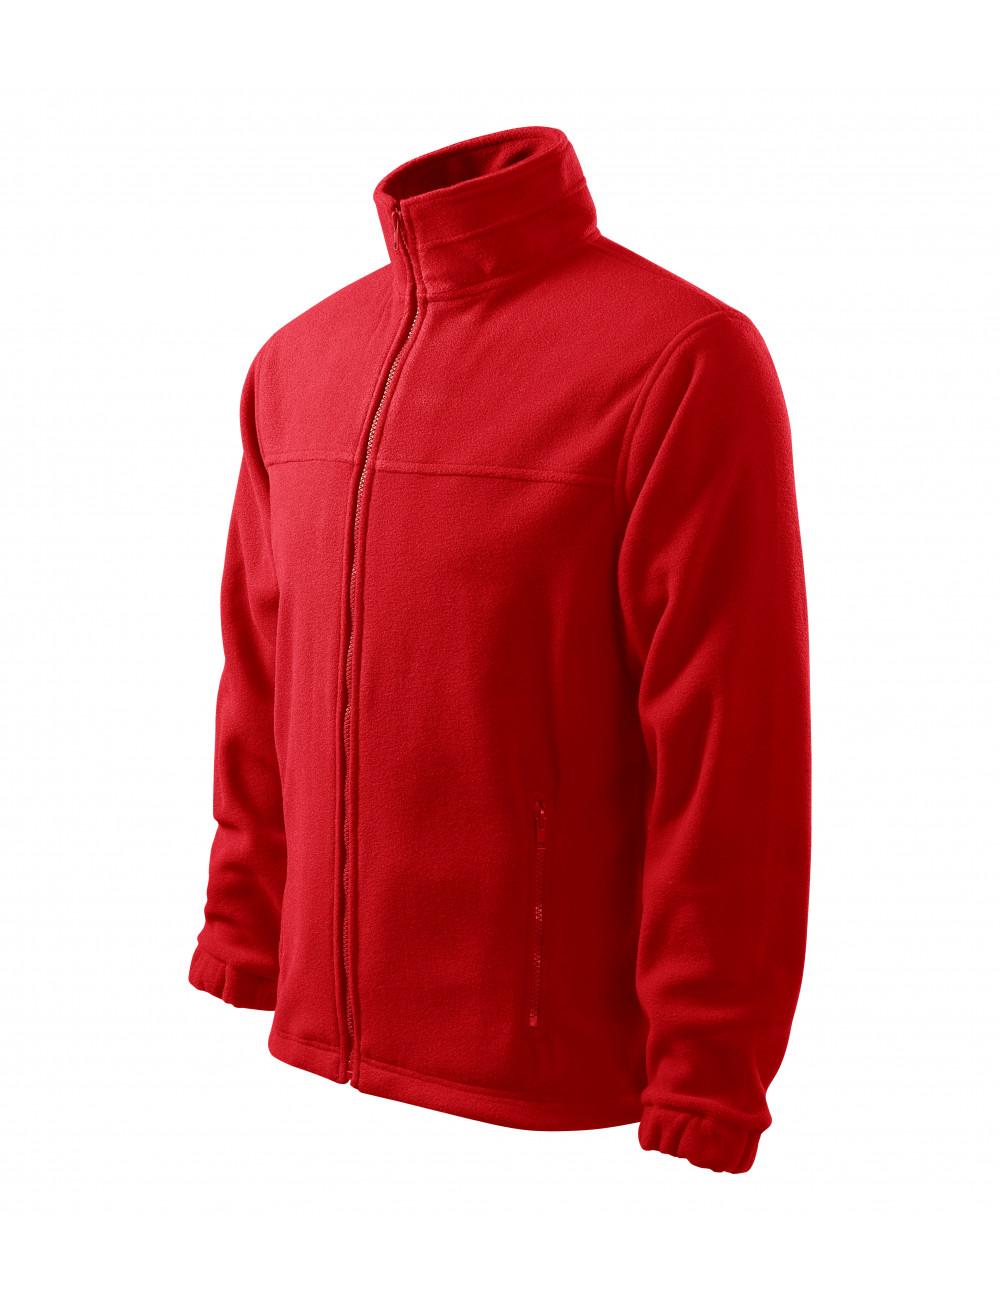 Adler RIMECK Polar męski Jacket 501 czerwony